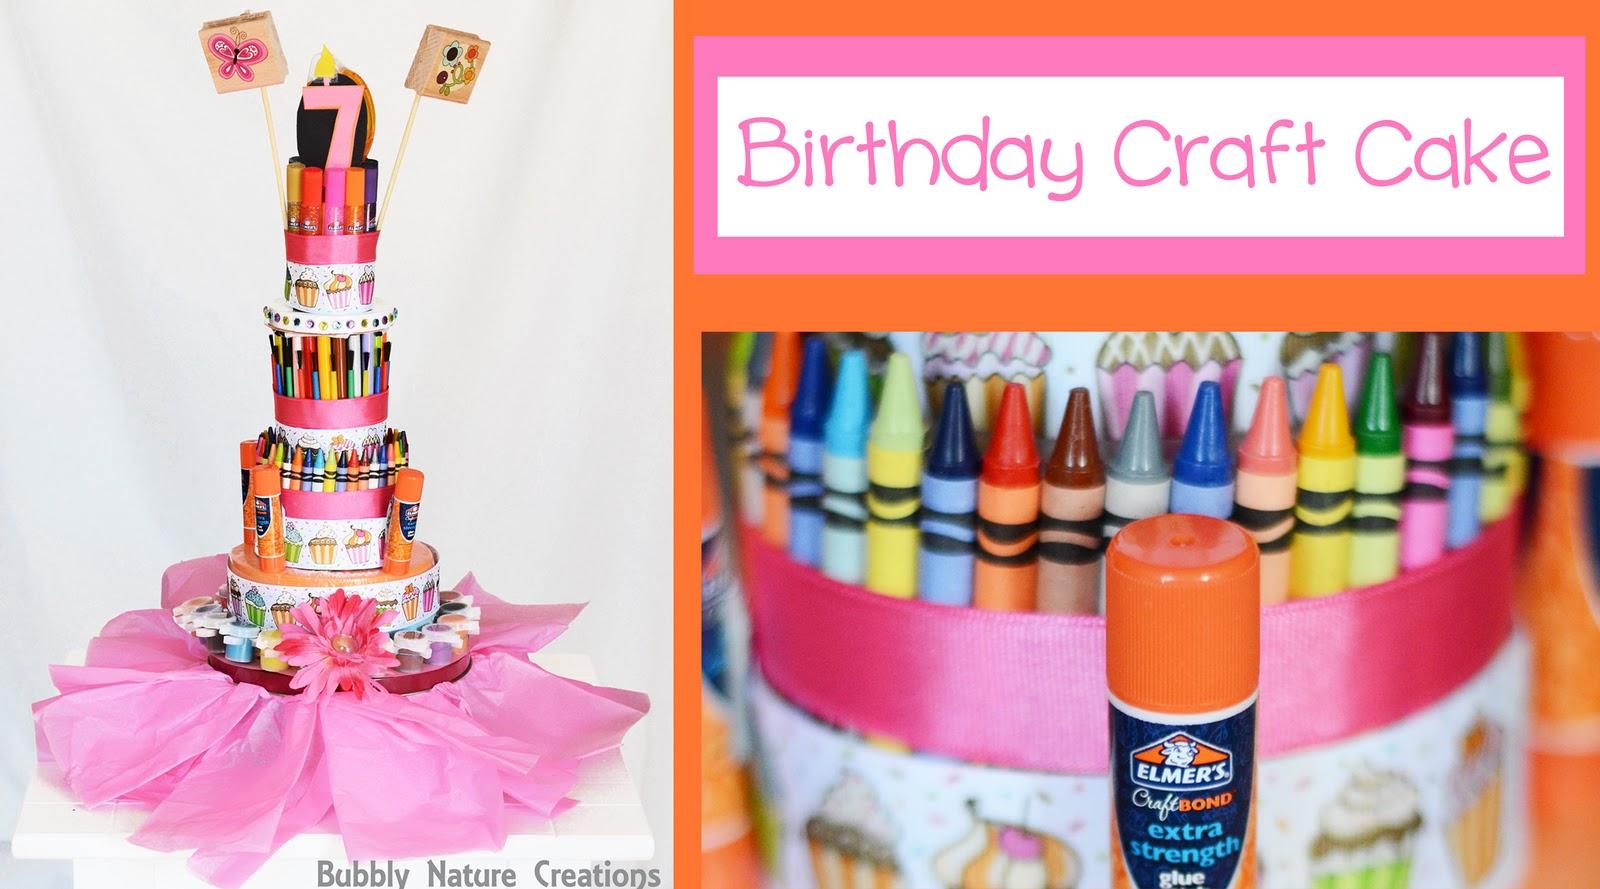 Birthday craft cake sprinkle some fun for Birthday craft ideas for girls